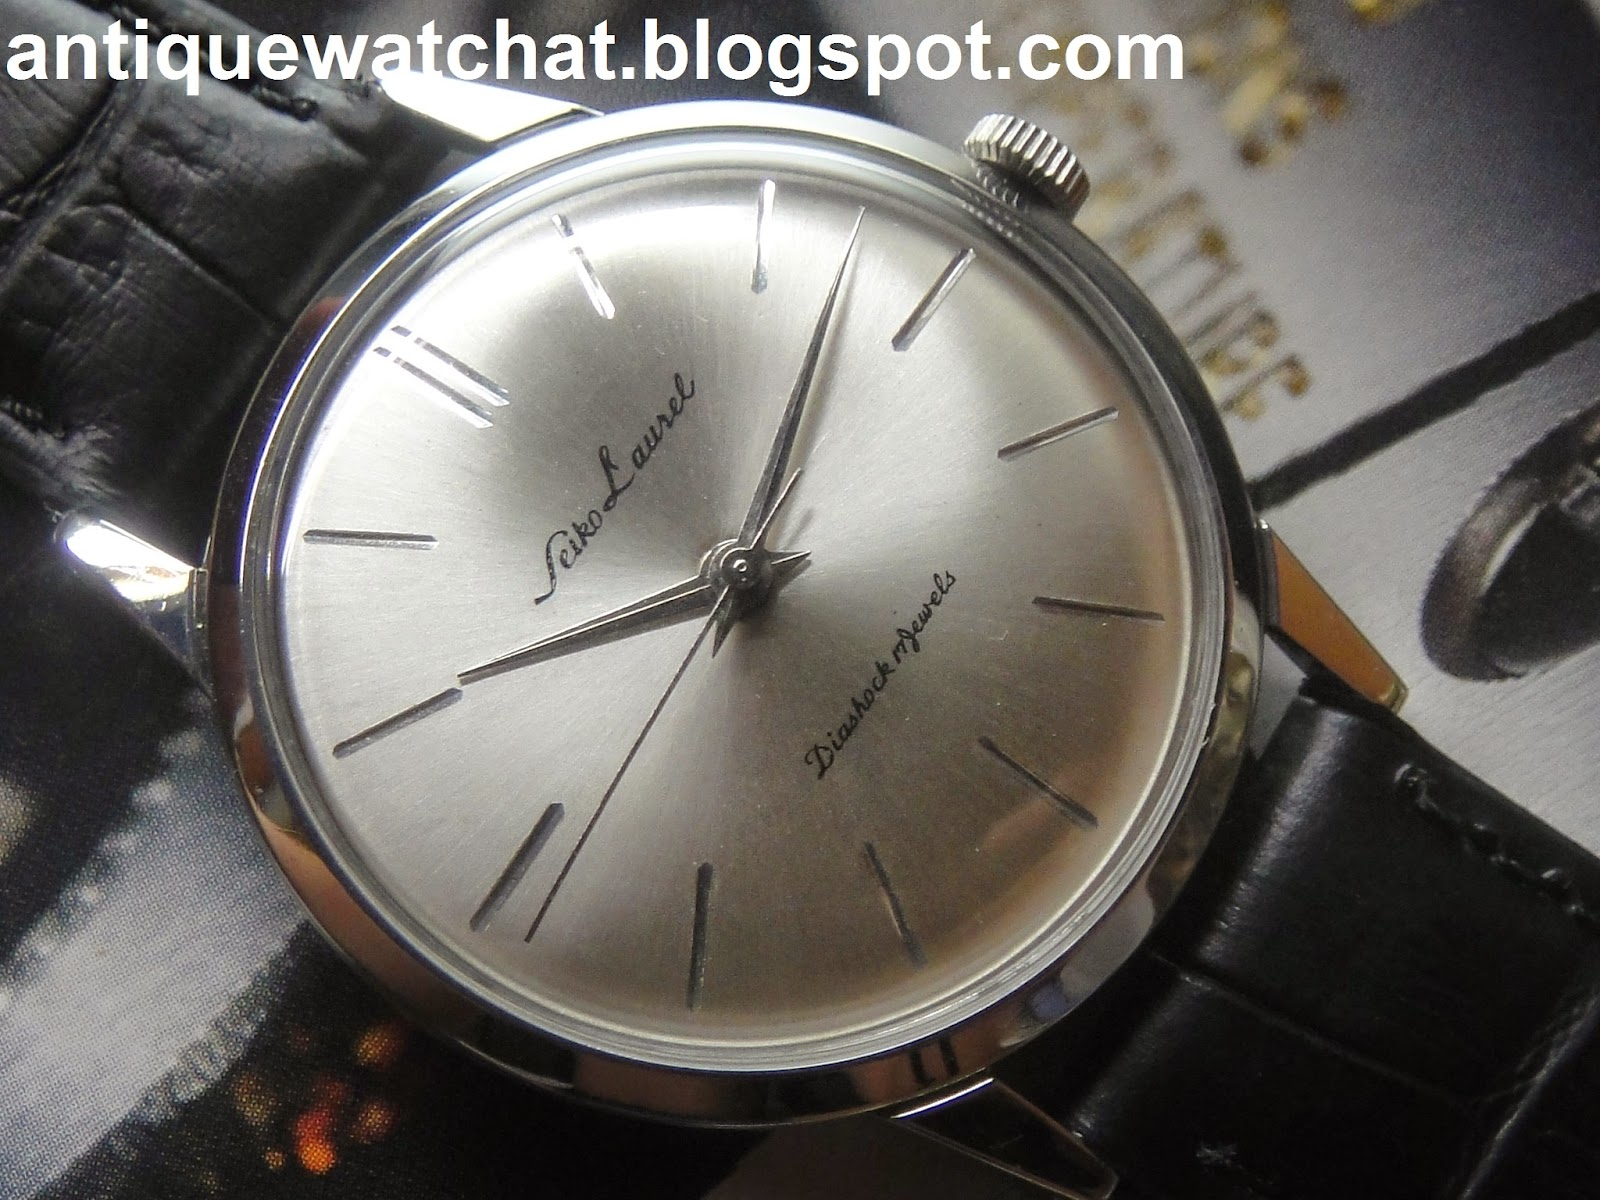 Antique Watch Bar Seiko Laurel Diashock 03 Sold